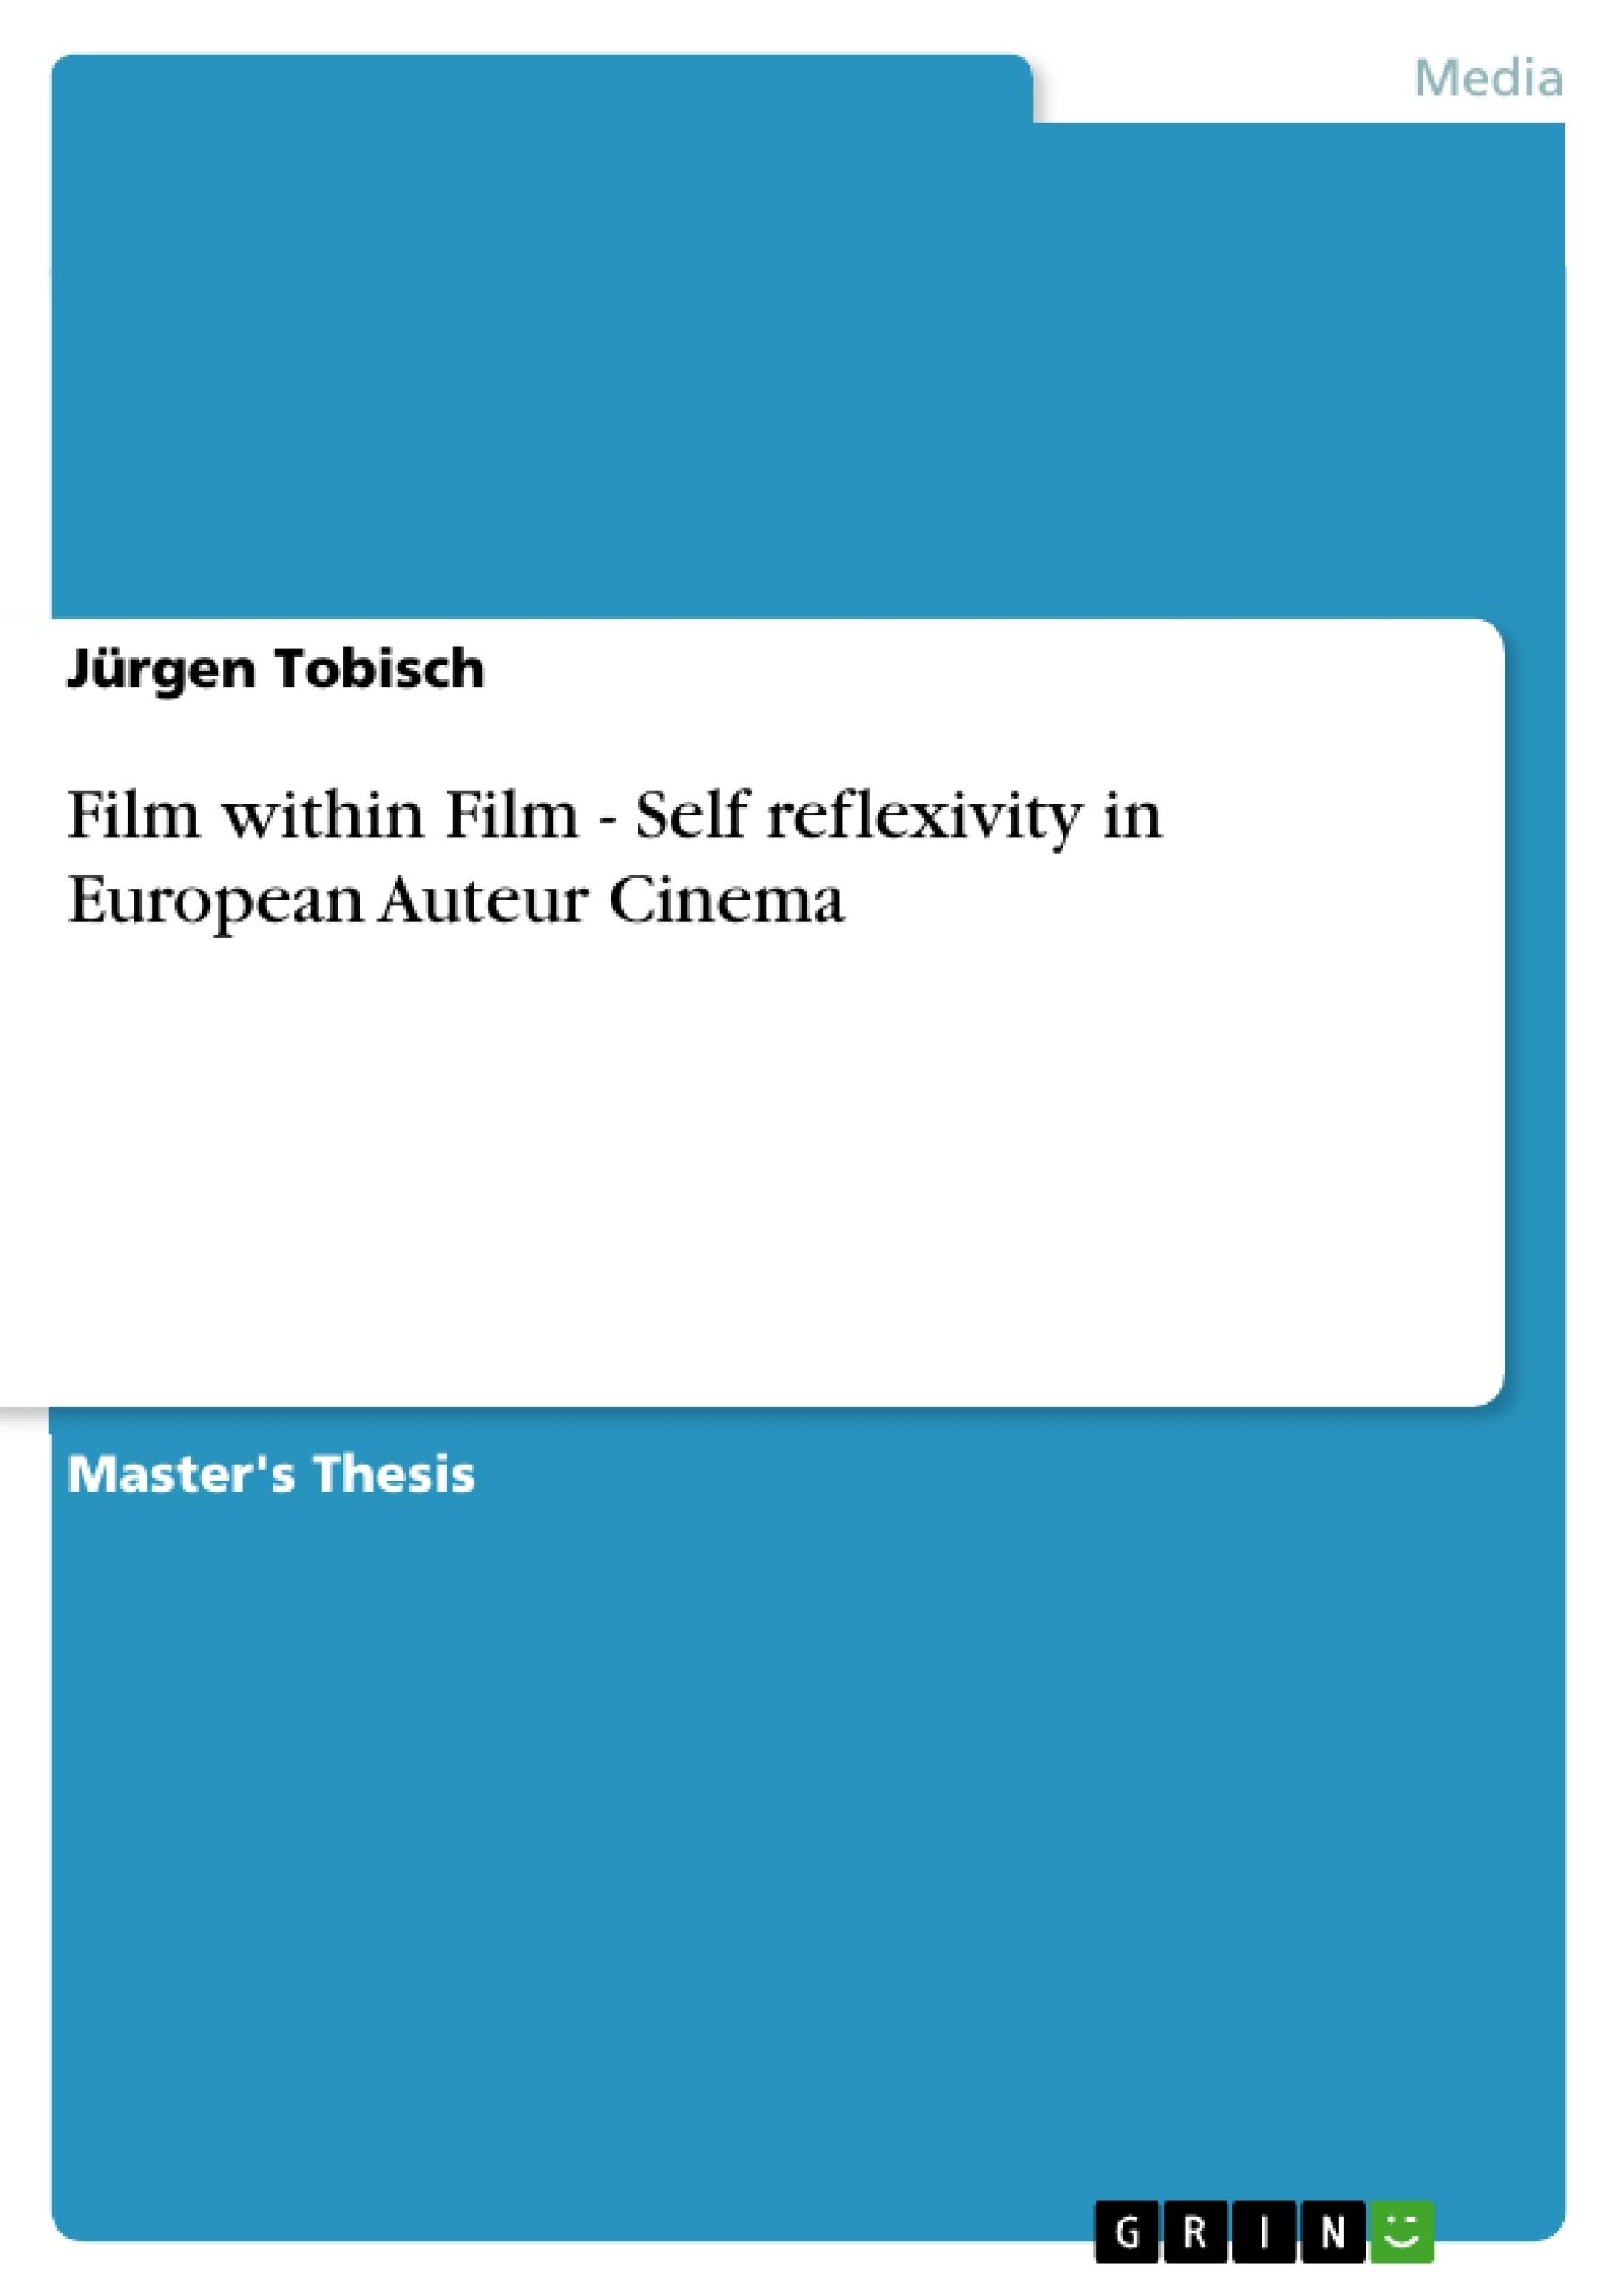 Title: Film within Film - Self reflexivity in European Auteur Cinema